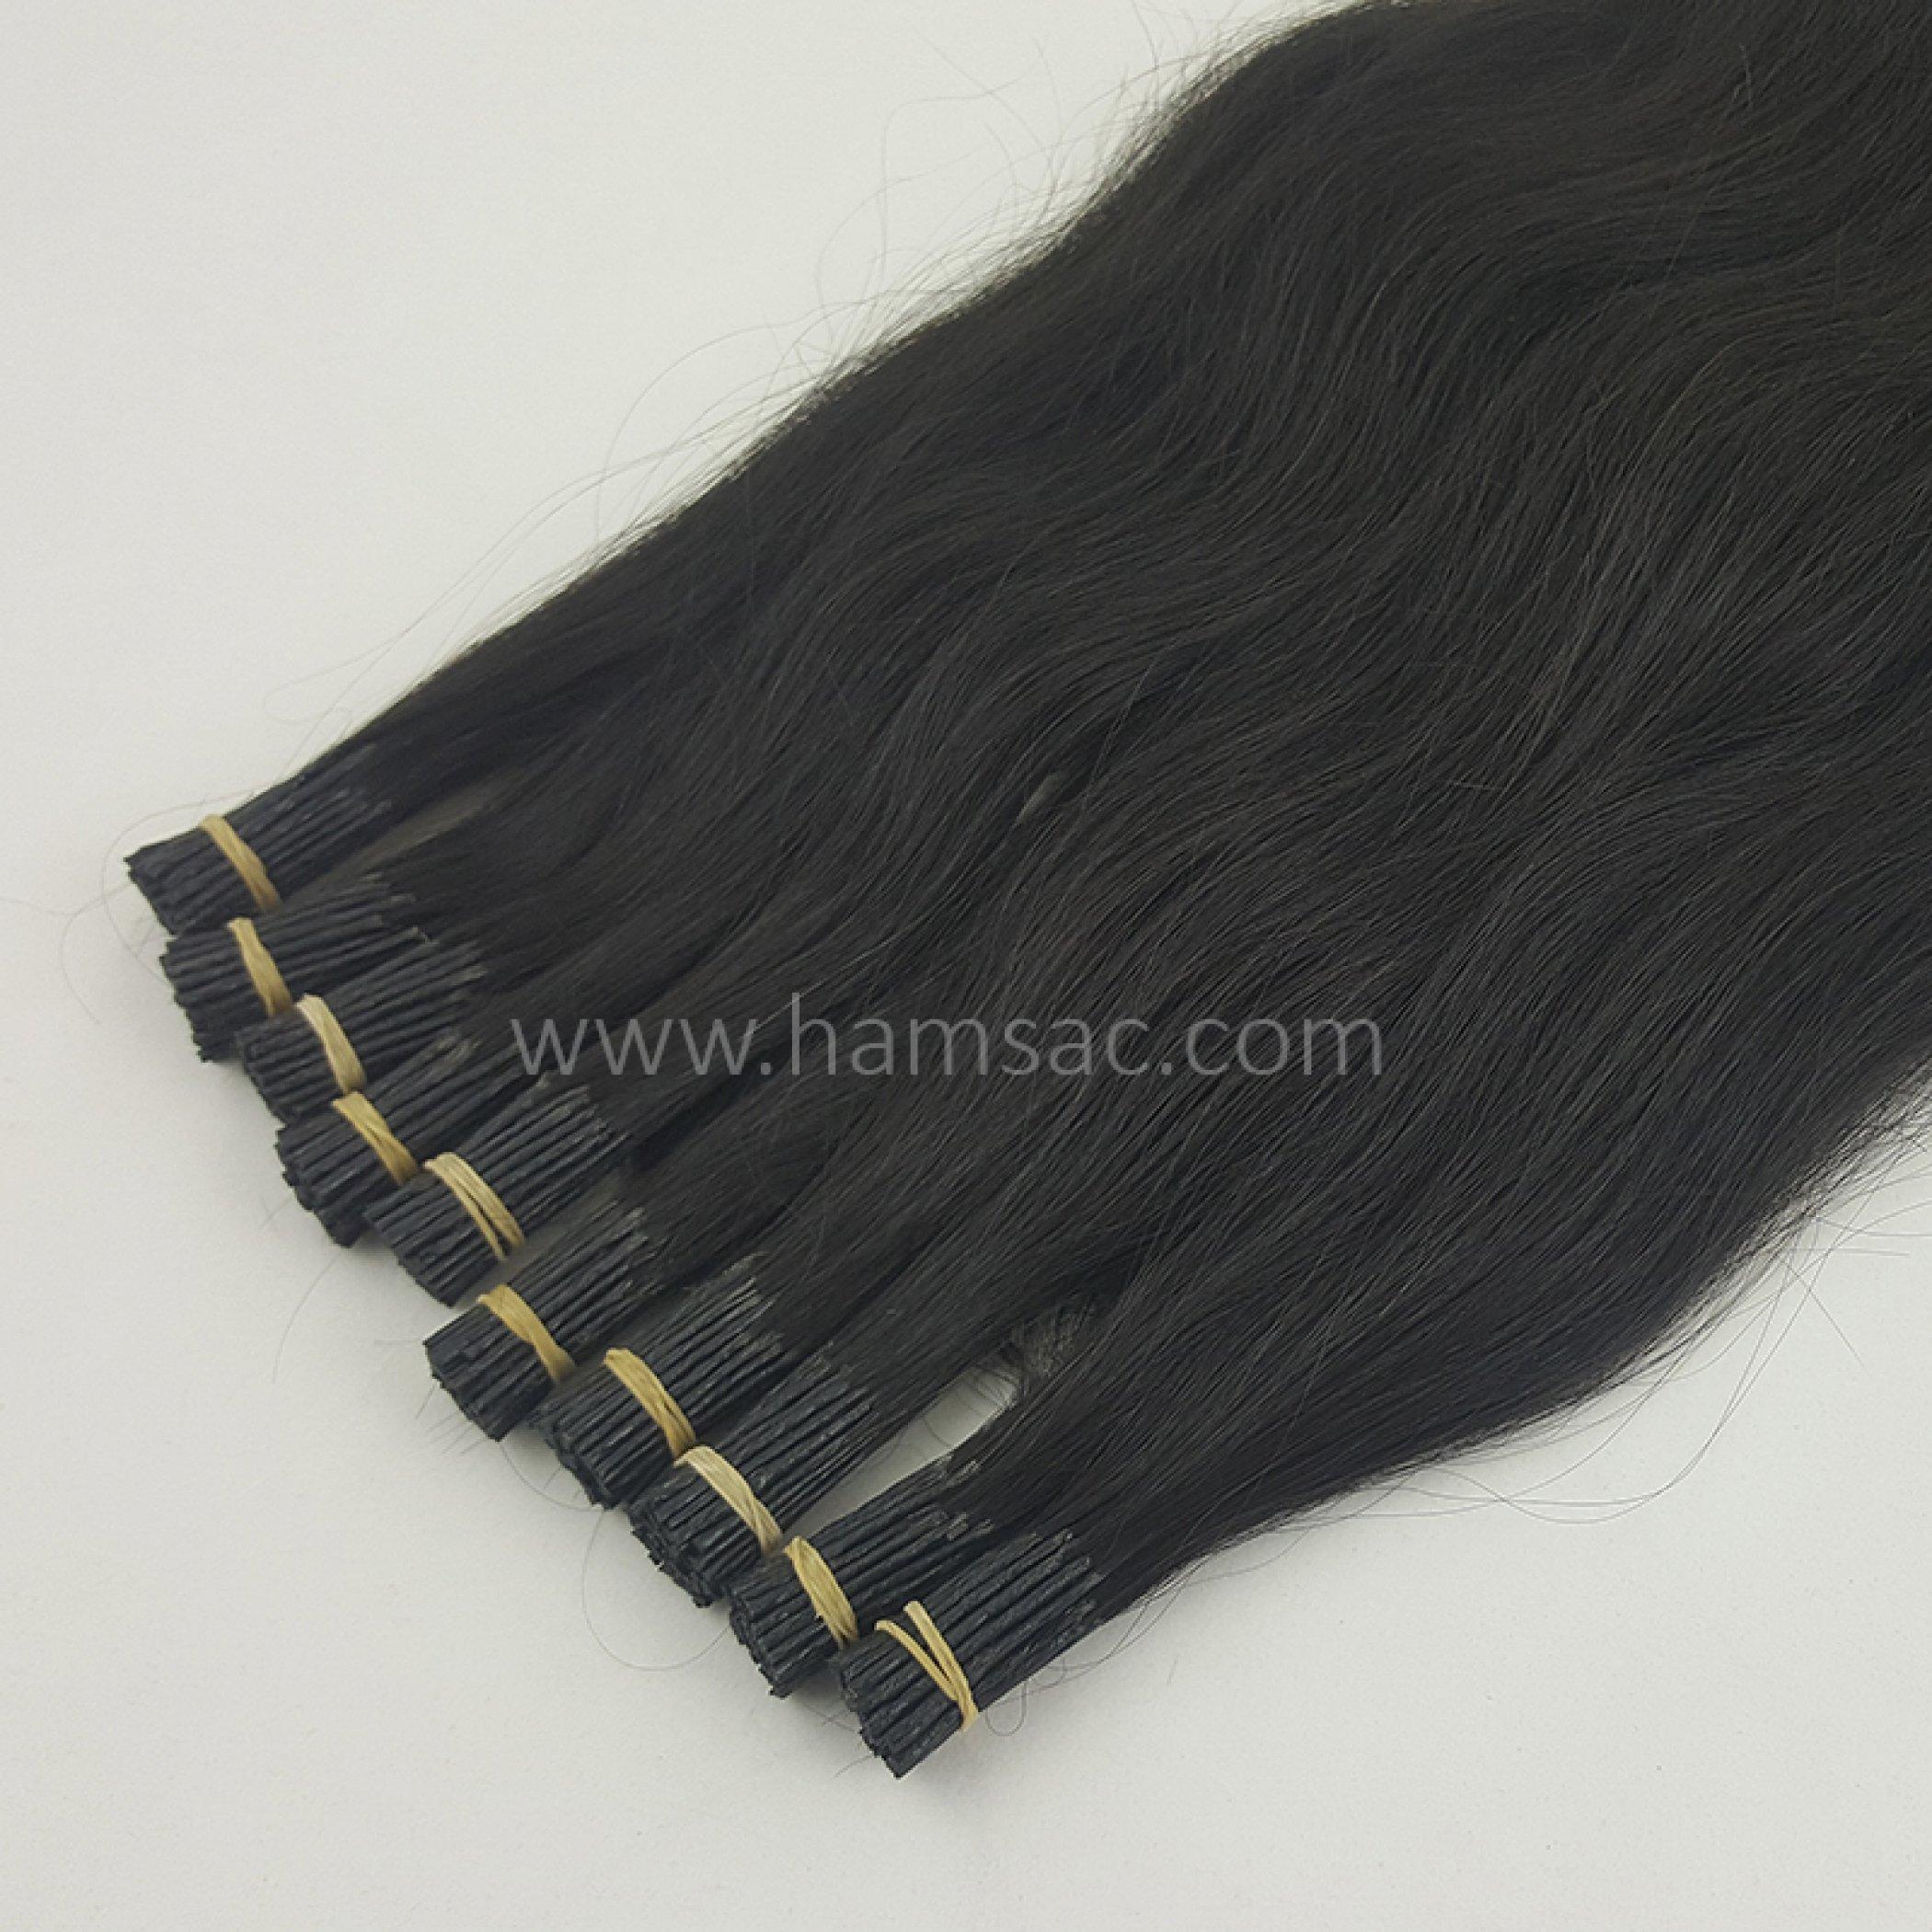 50 cm Doğal Boncuk Kaynak Saç